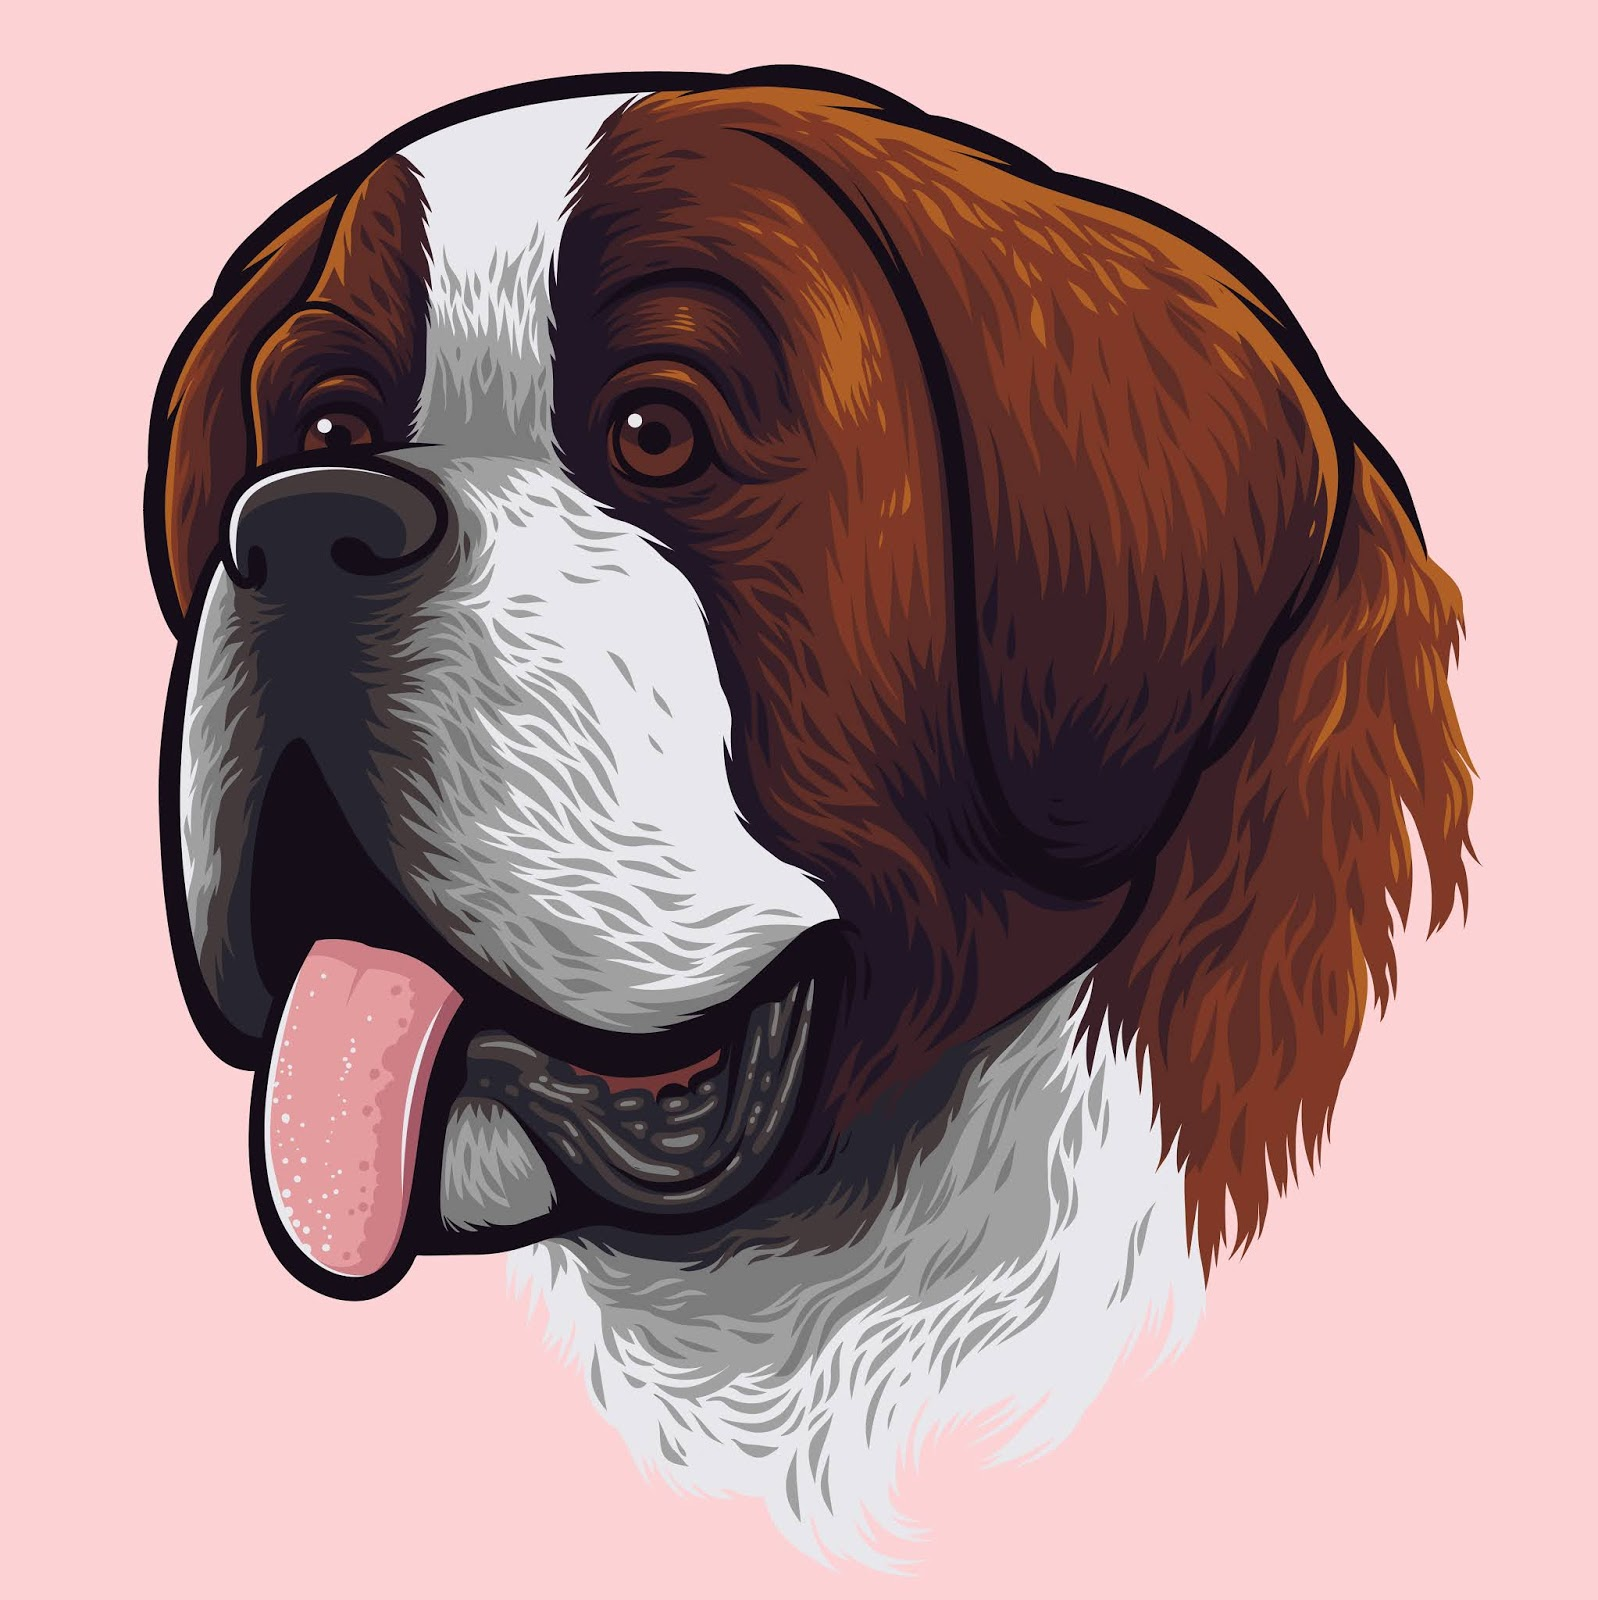 Saint Bernard Dog Portrait Free Download Vector CDR, AI, EPS and PNG Formats